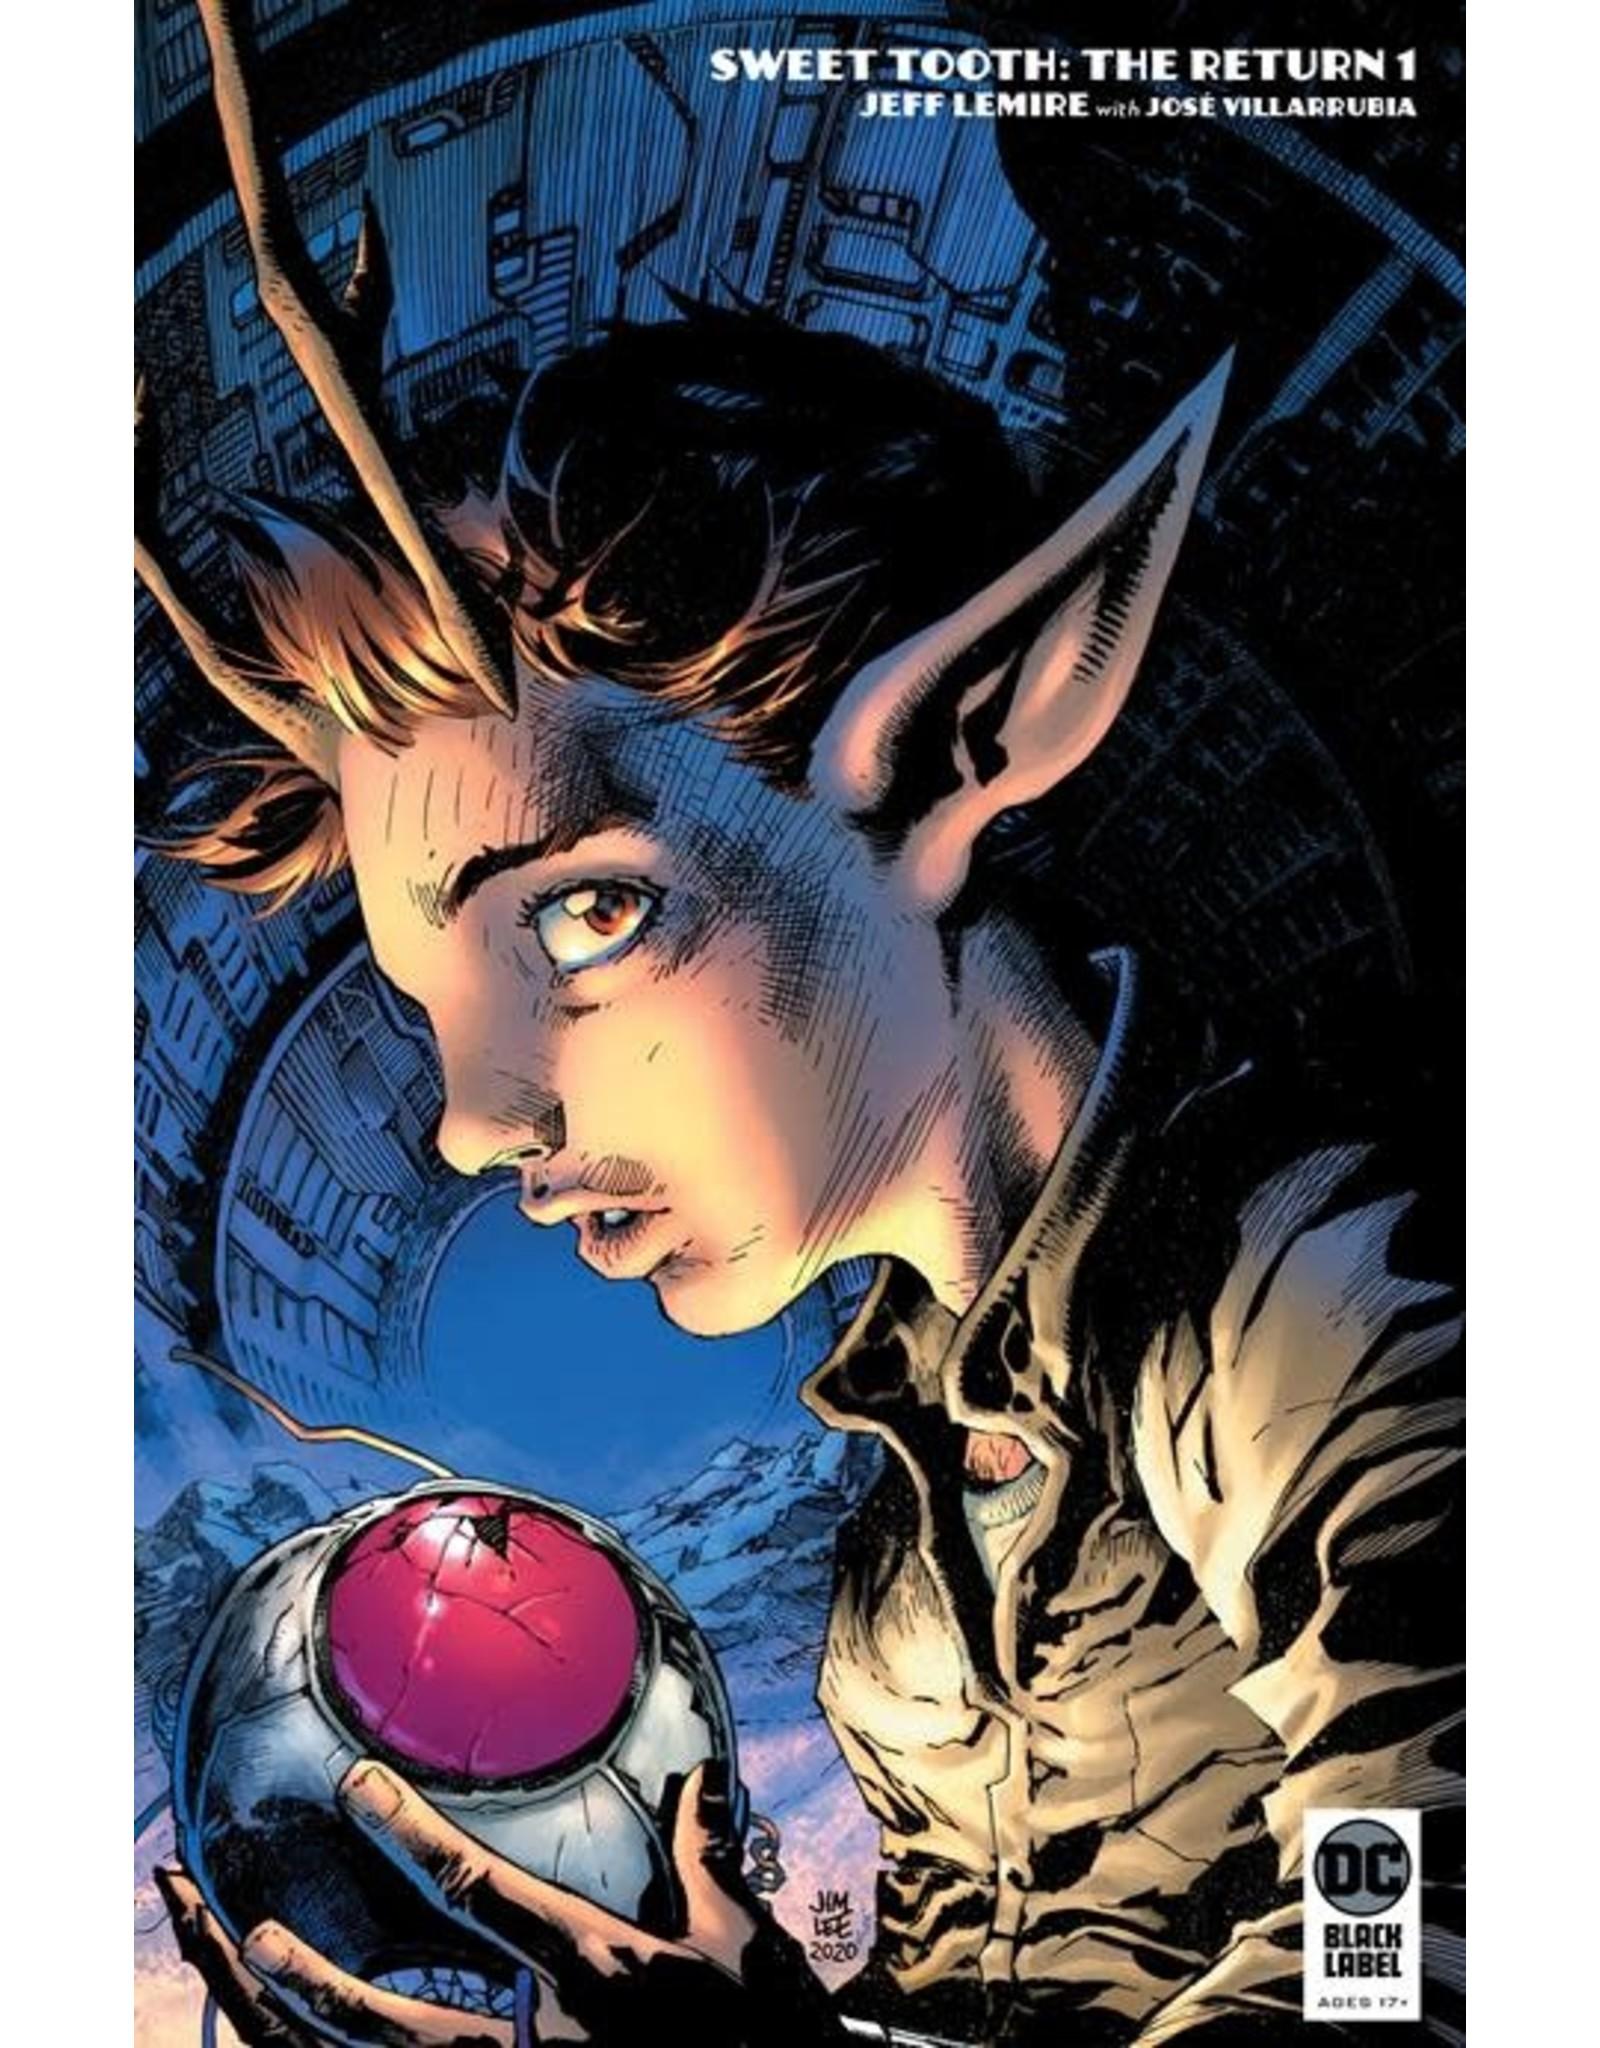 DC Comics SWEET TOOTH THE RETURN #1 (OF 6) CVR B JIM LEE CARD STOCK VAR (MR)